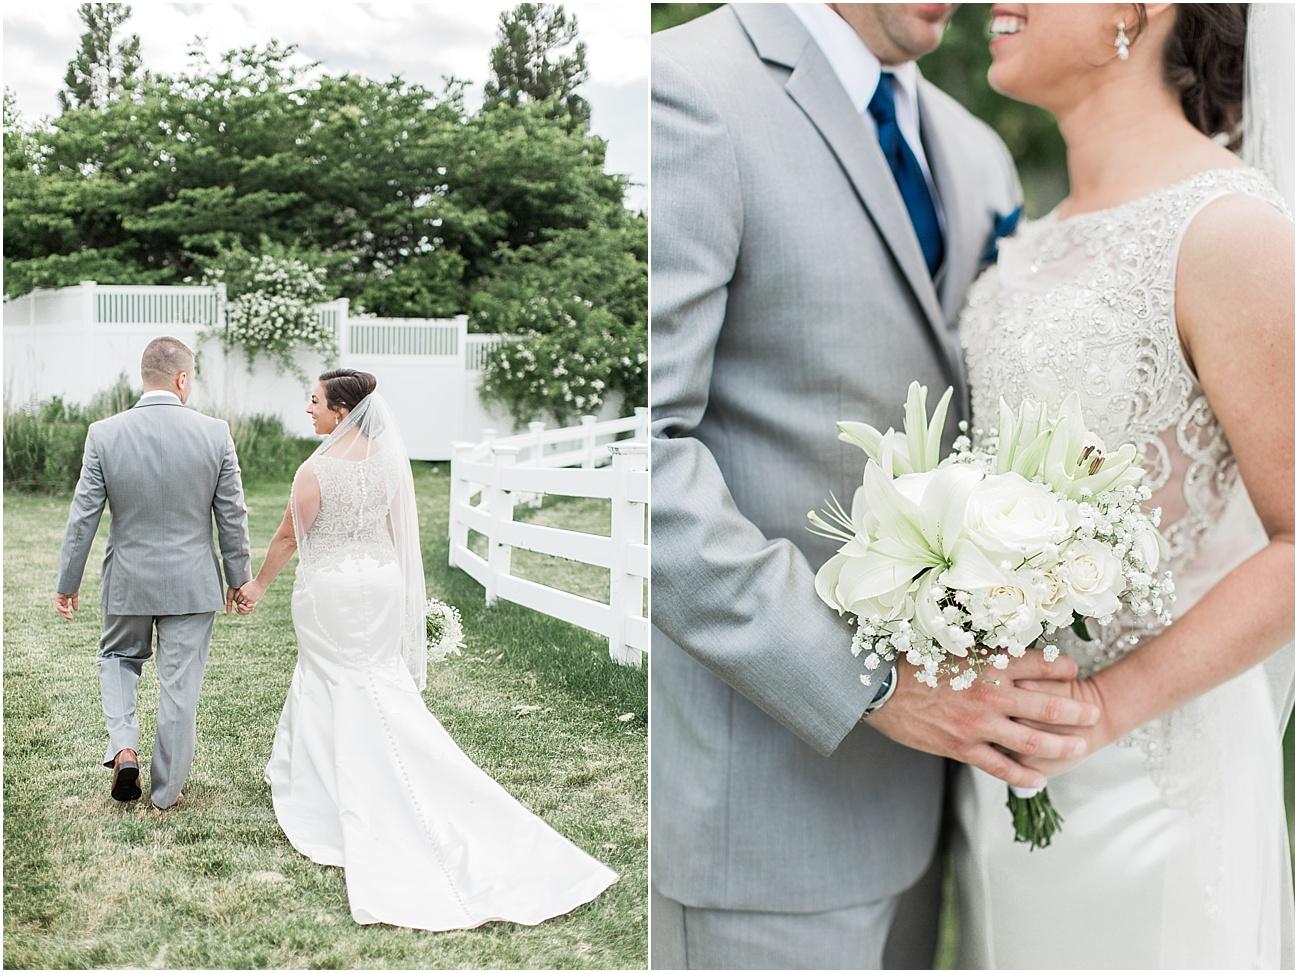 nicole_stephen_cape_club_nicky_falmouth_cod_boston_wedding_photographer_meredith_jane_photography_photo_0177.jpg